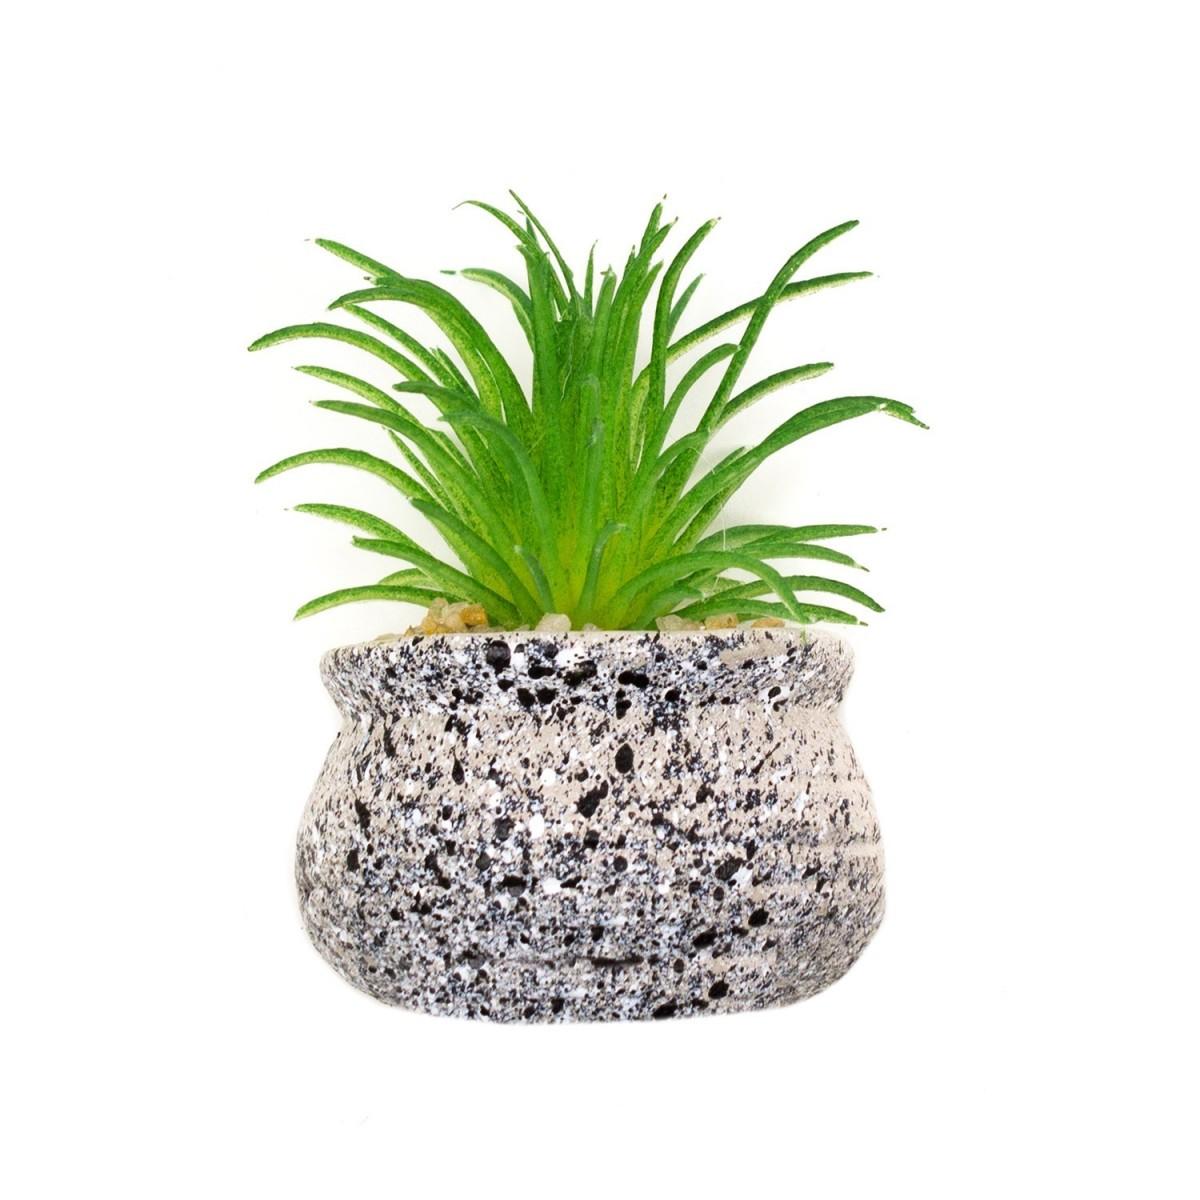 Planta suculenta artificiala tip magnet frigider Pami Flower 6x3.5 cm Verde F419-293-3